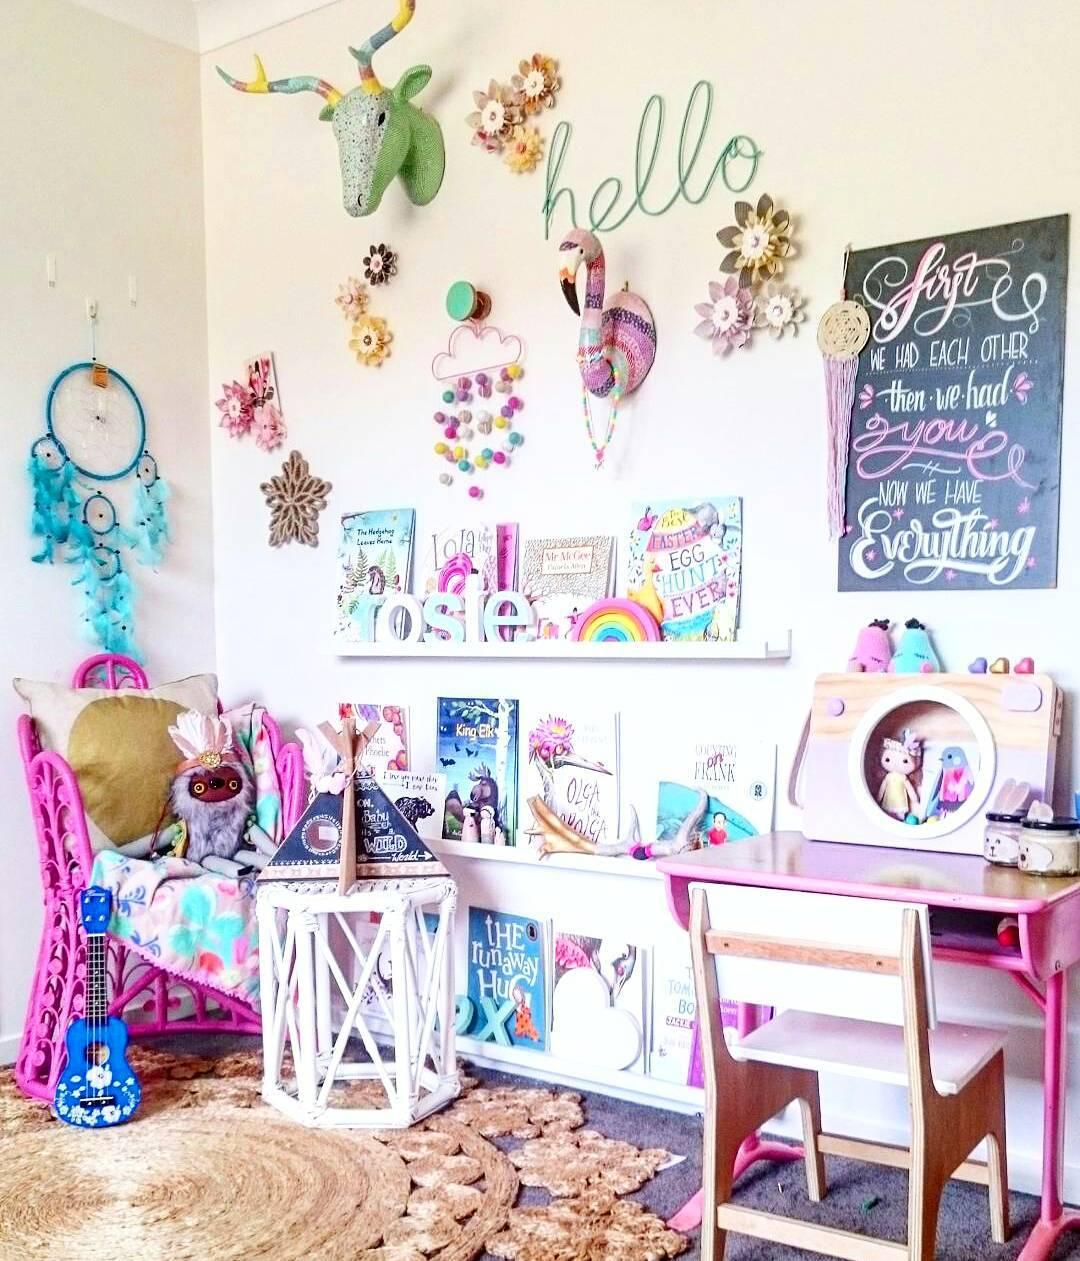 40 Elegant And Bohemian Kids Room Decor Ideas For Kids Who